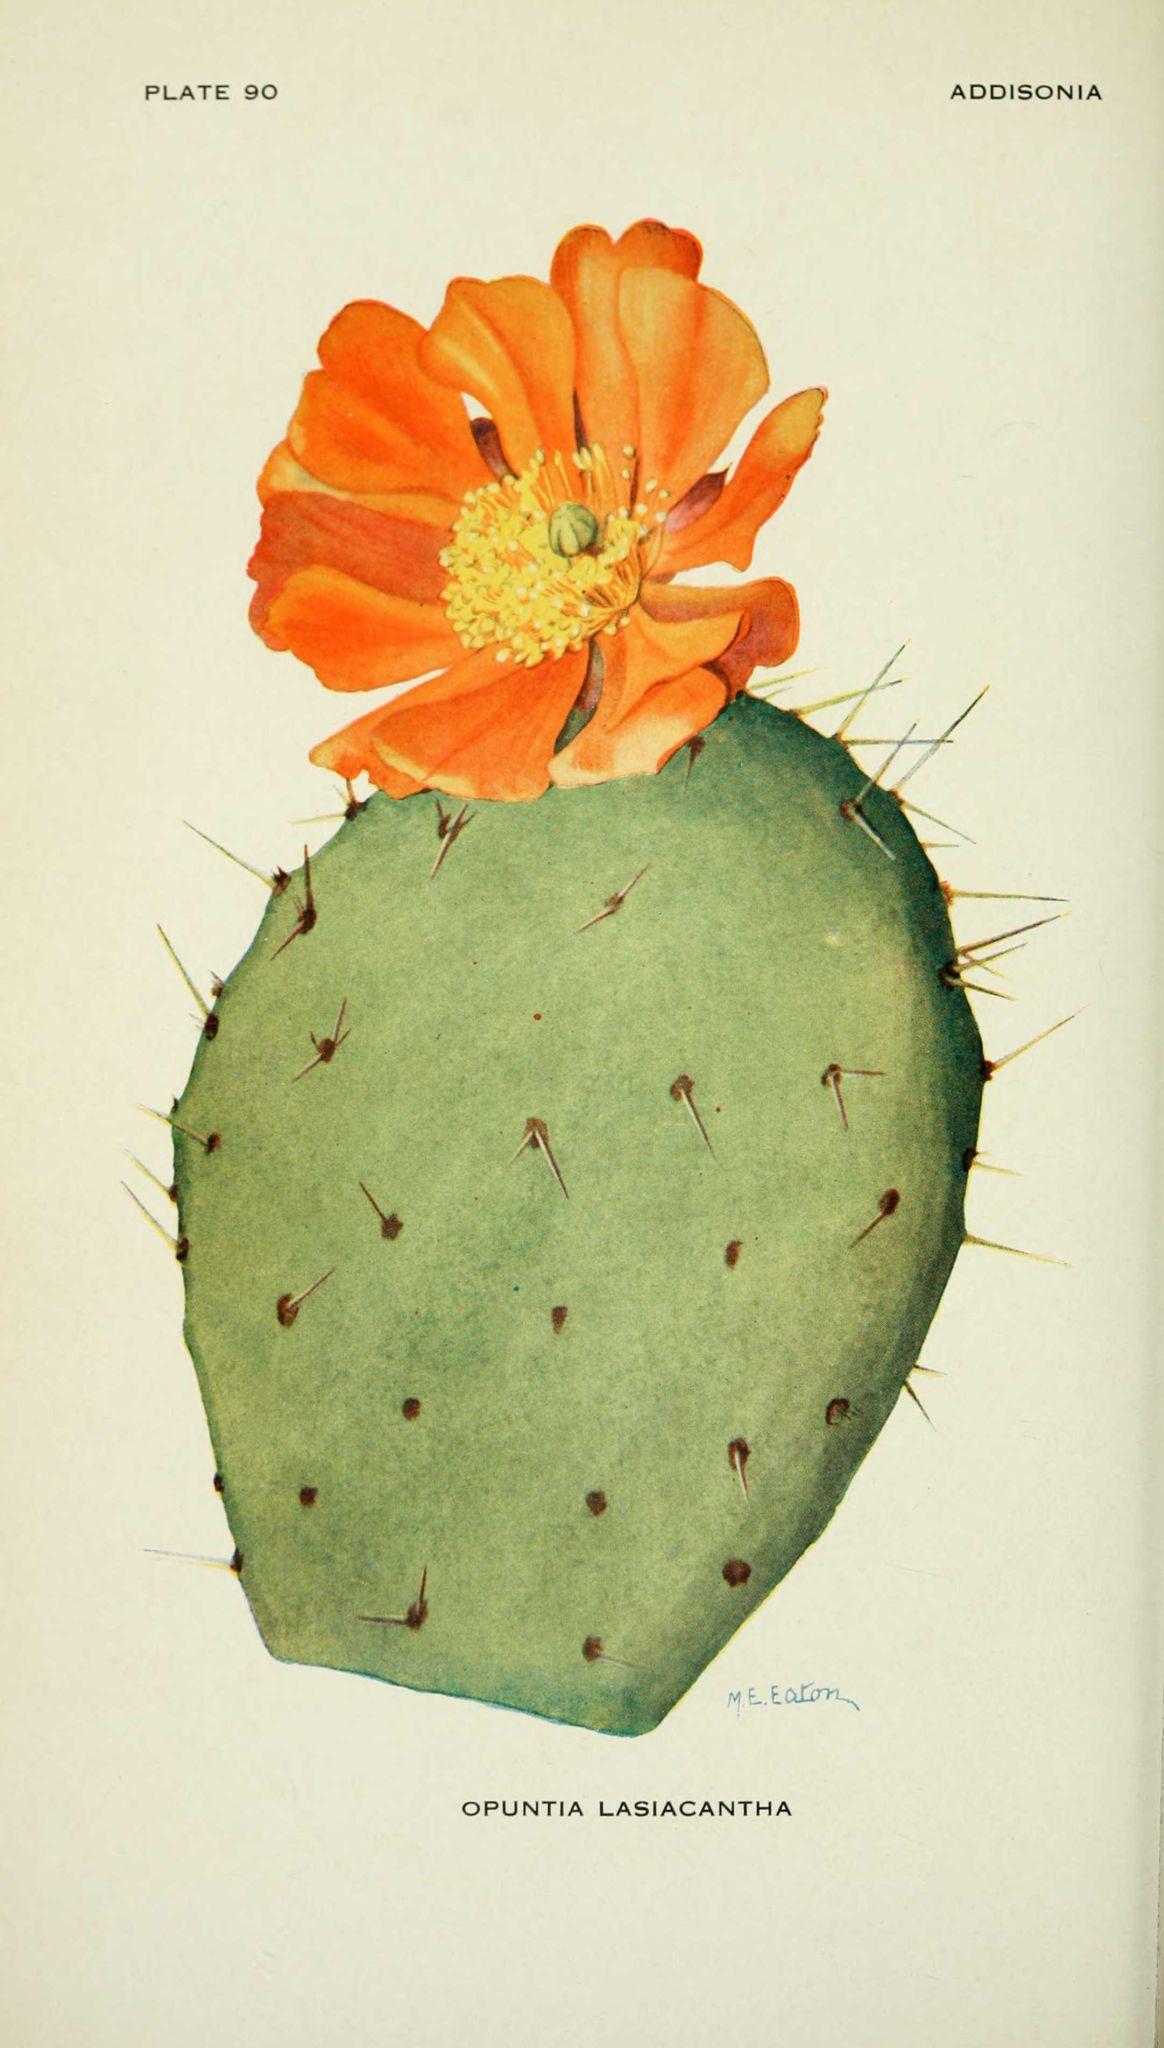 Resultats De La Recherche Cactus Opuntia Lasiacantha Cactus